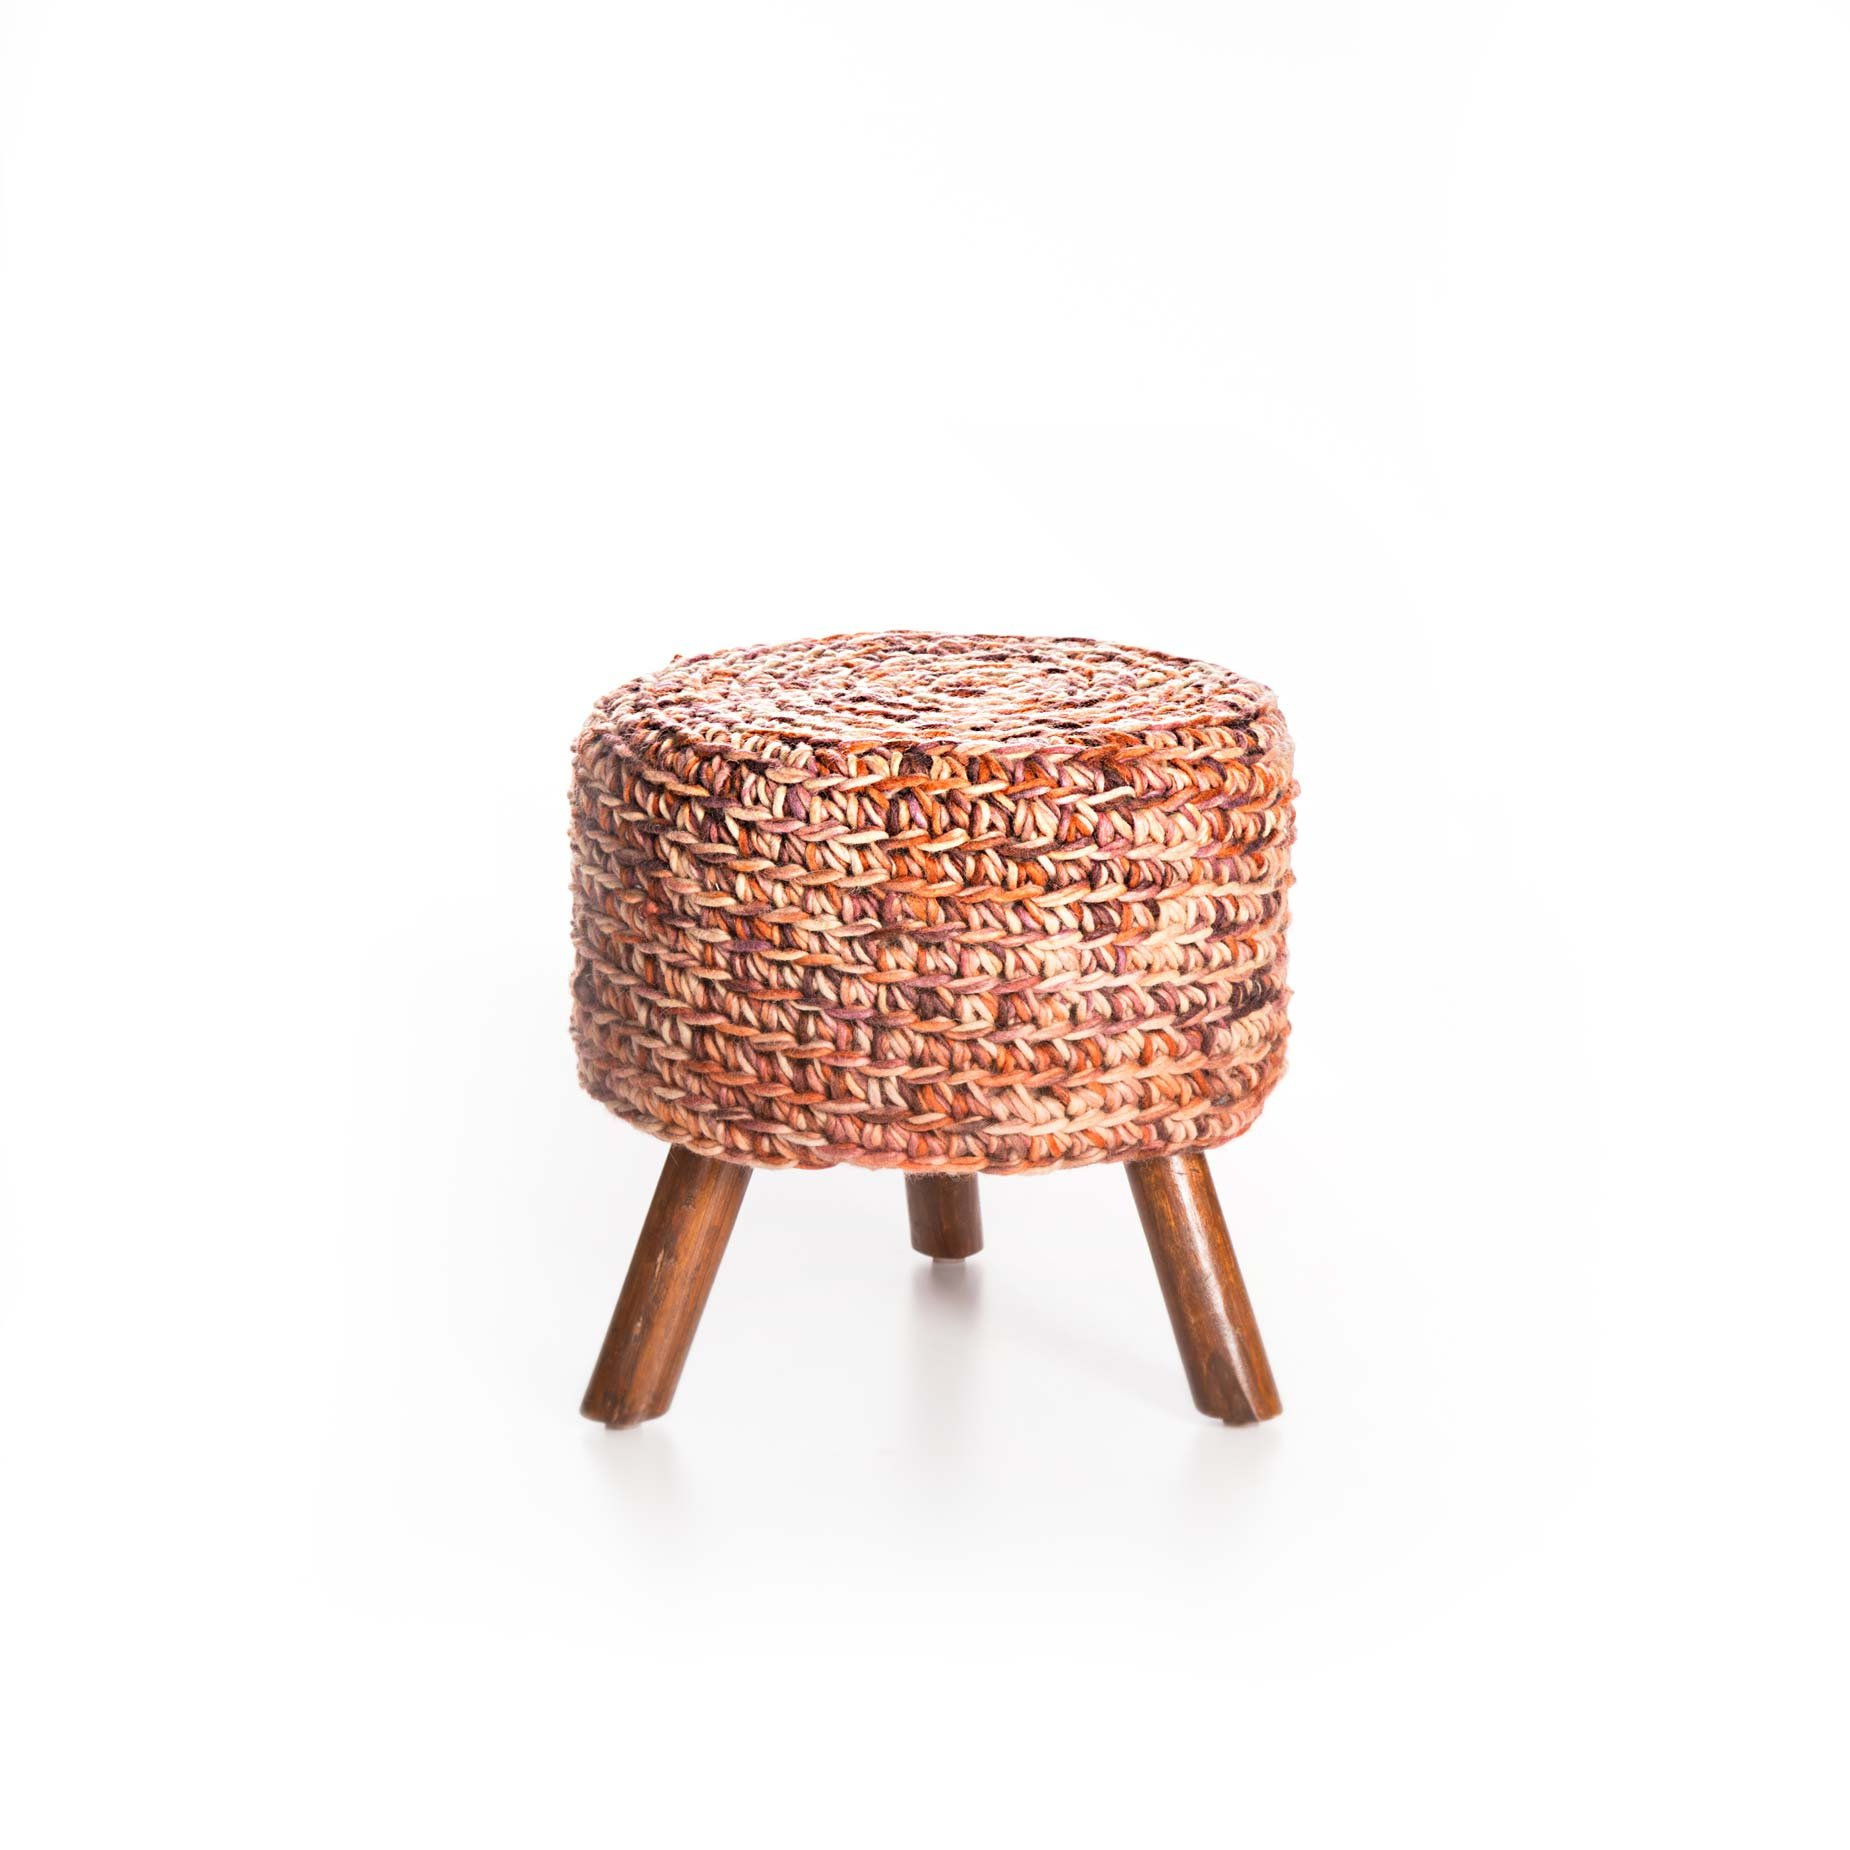 Artemano CH0585318 Wool Top Stool